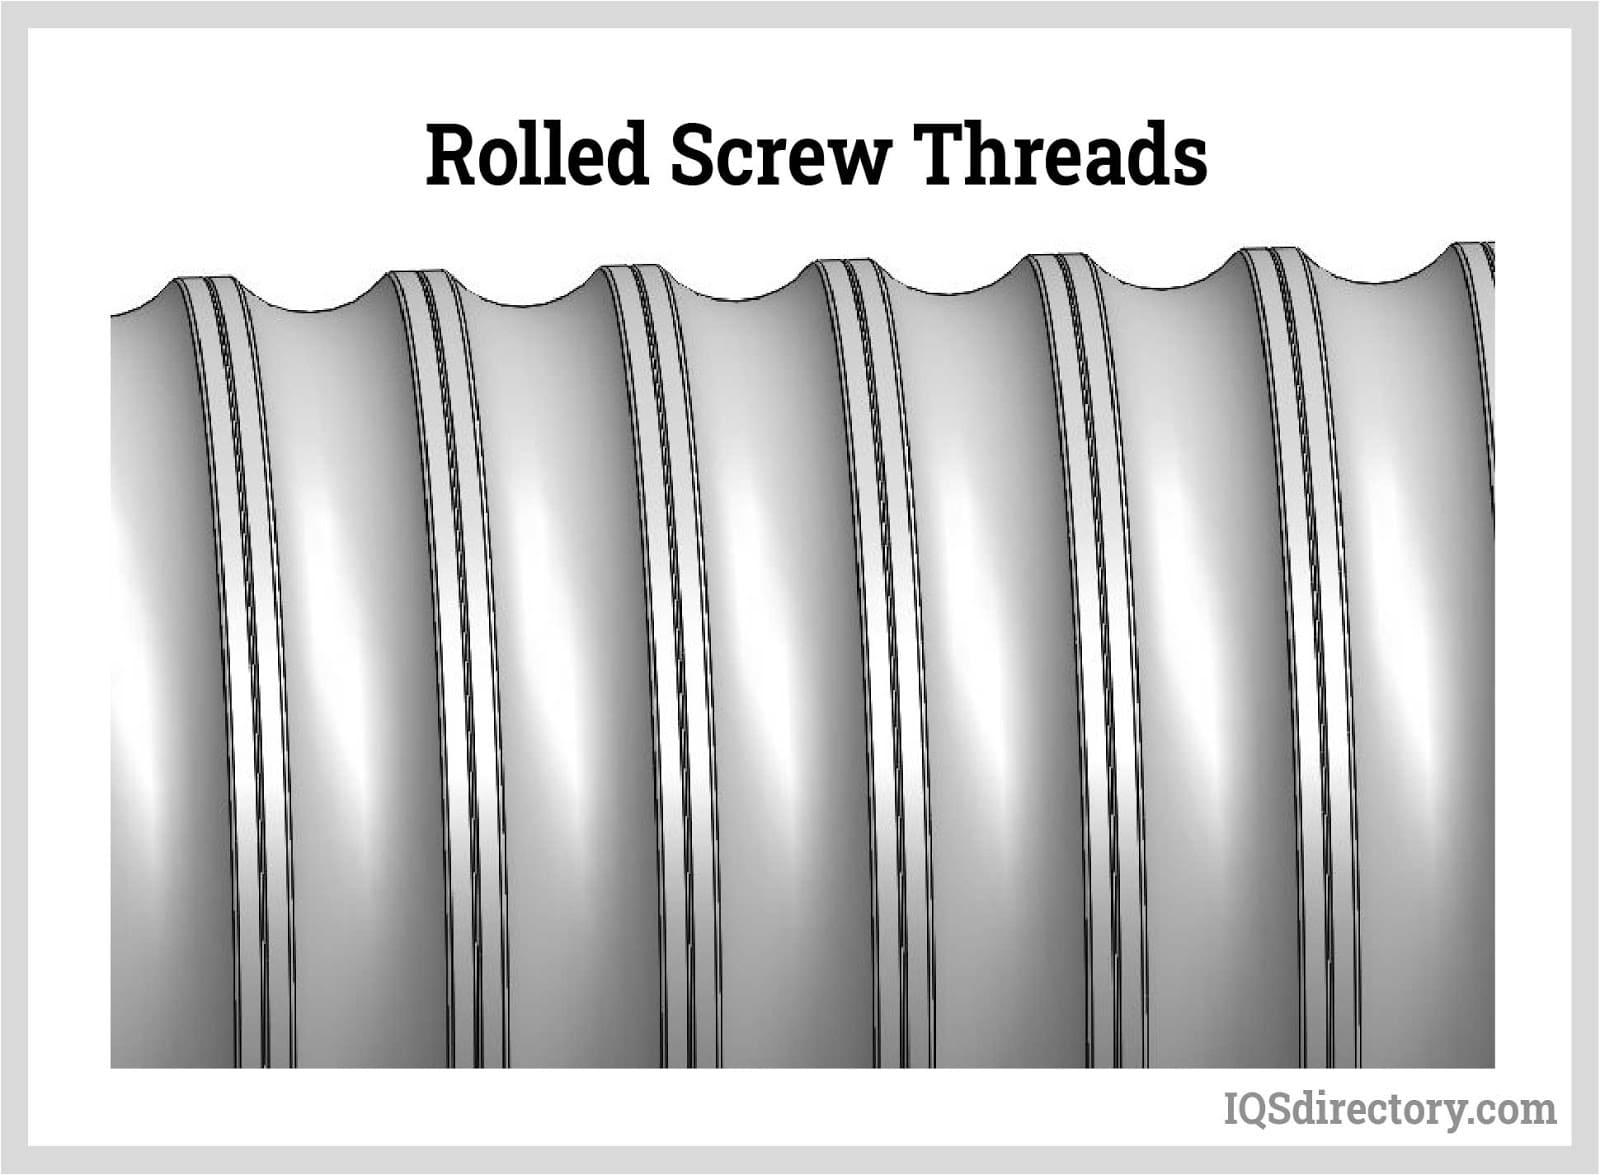 Rolled Screw Threads